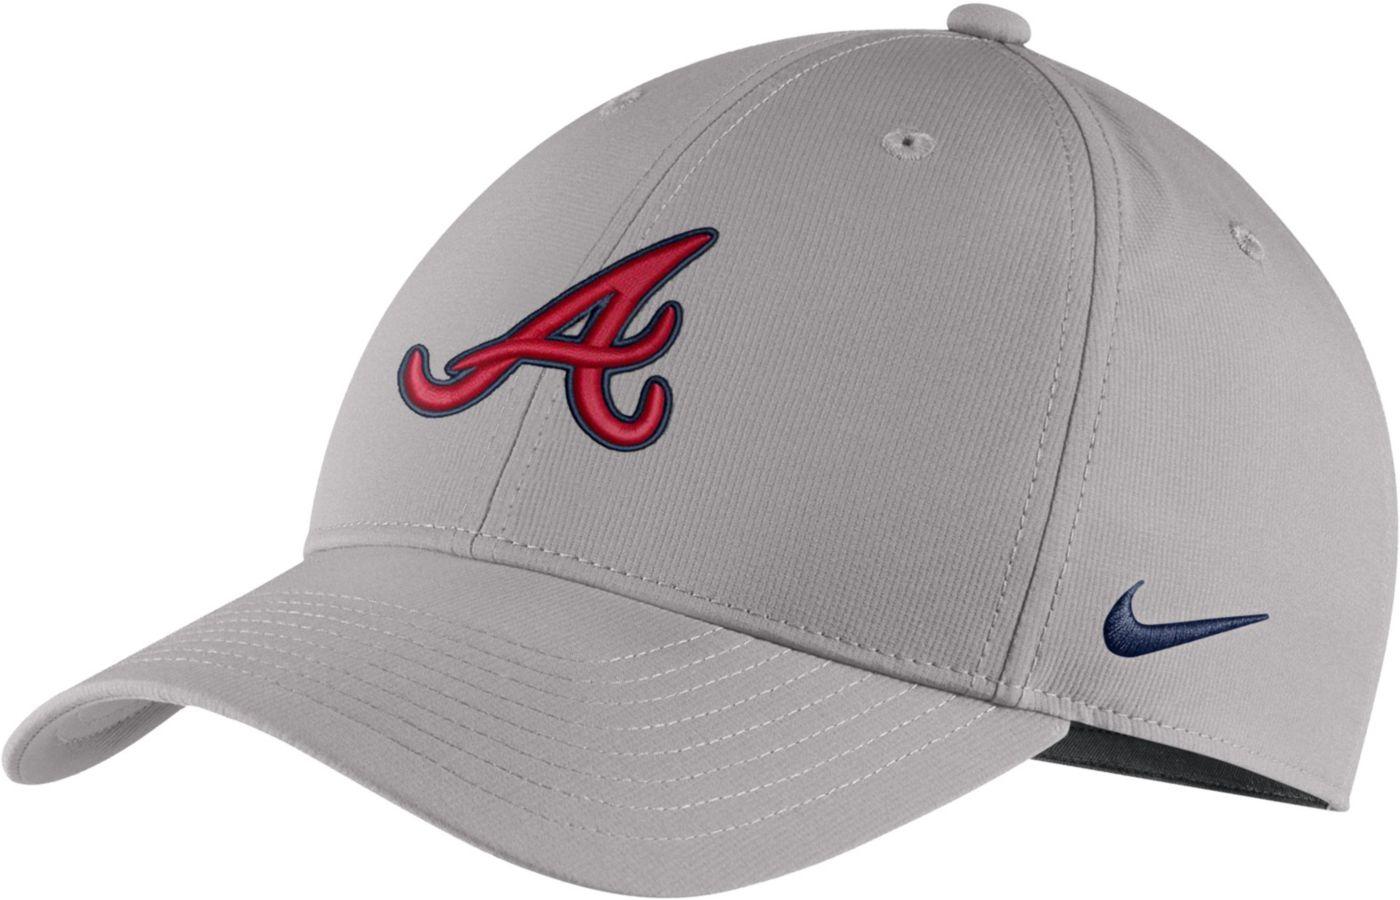 Nike Men's Atlanta Braves Dri-FIT Legacy 91 Adjustable Hat